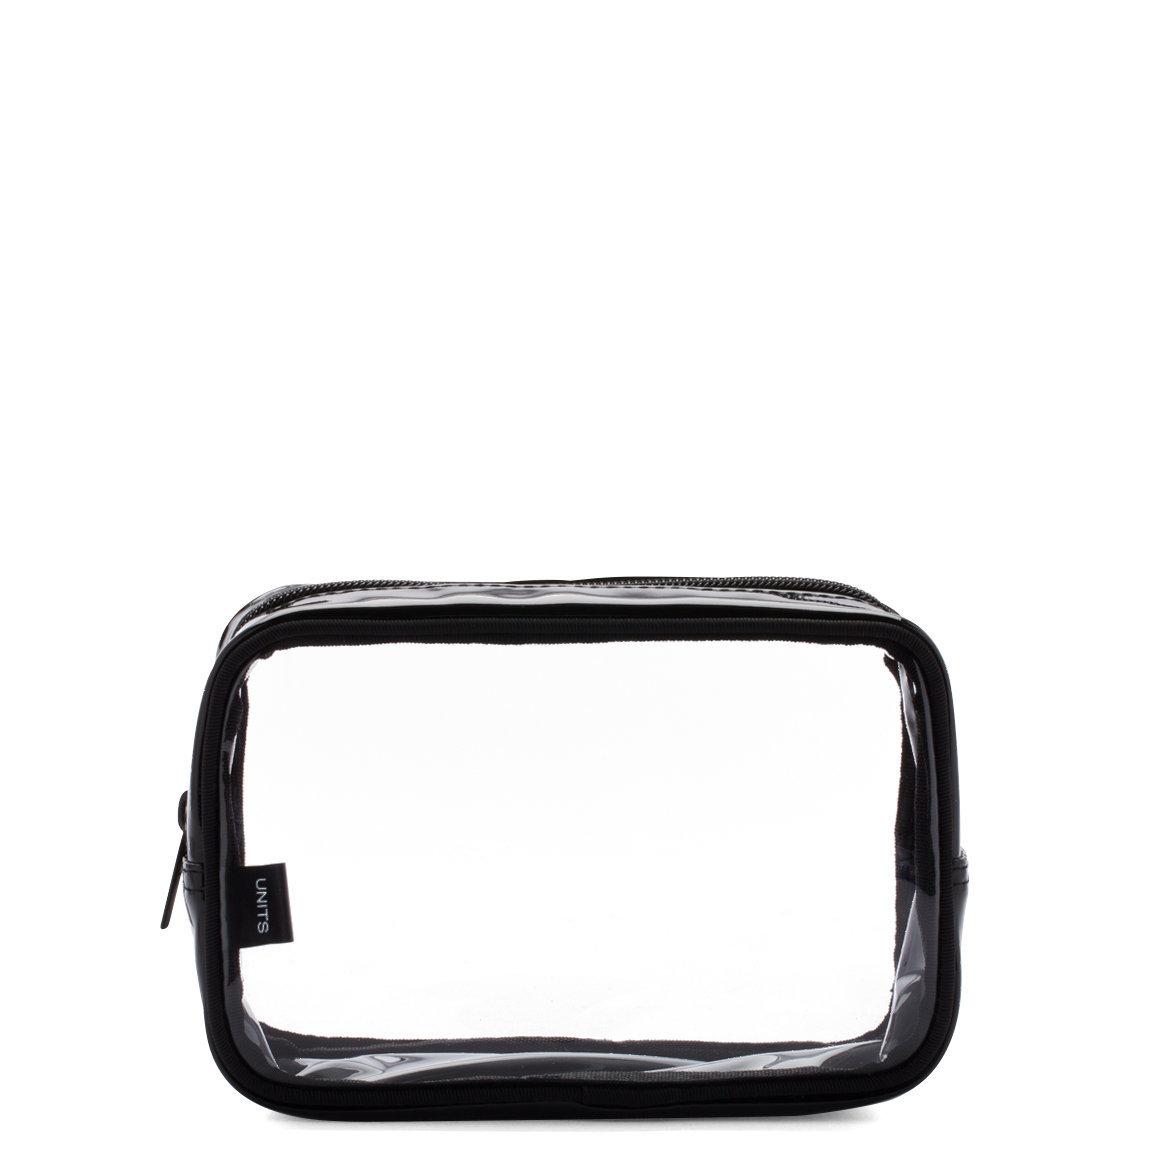 UNITS Unit 802 Small PVC Bag Black alternative view 1 - product swatch.